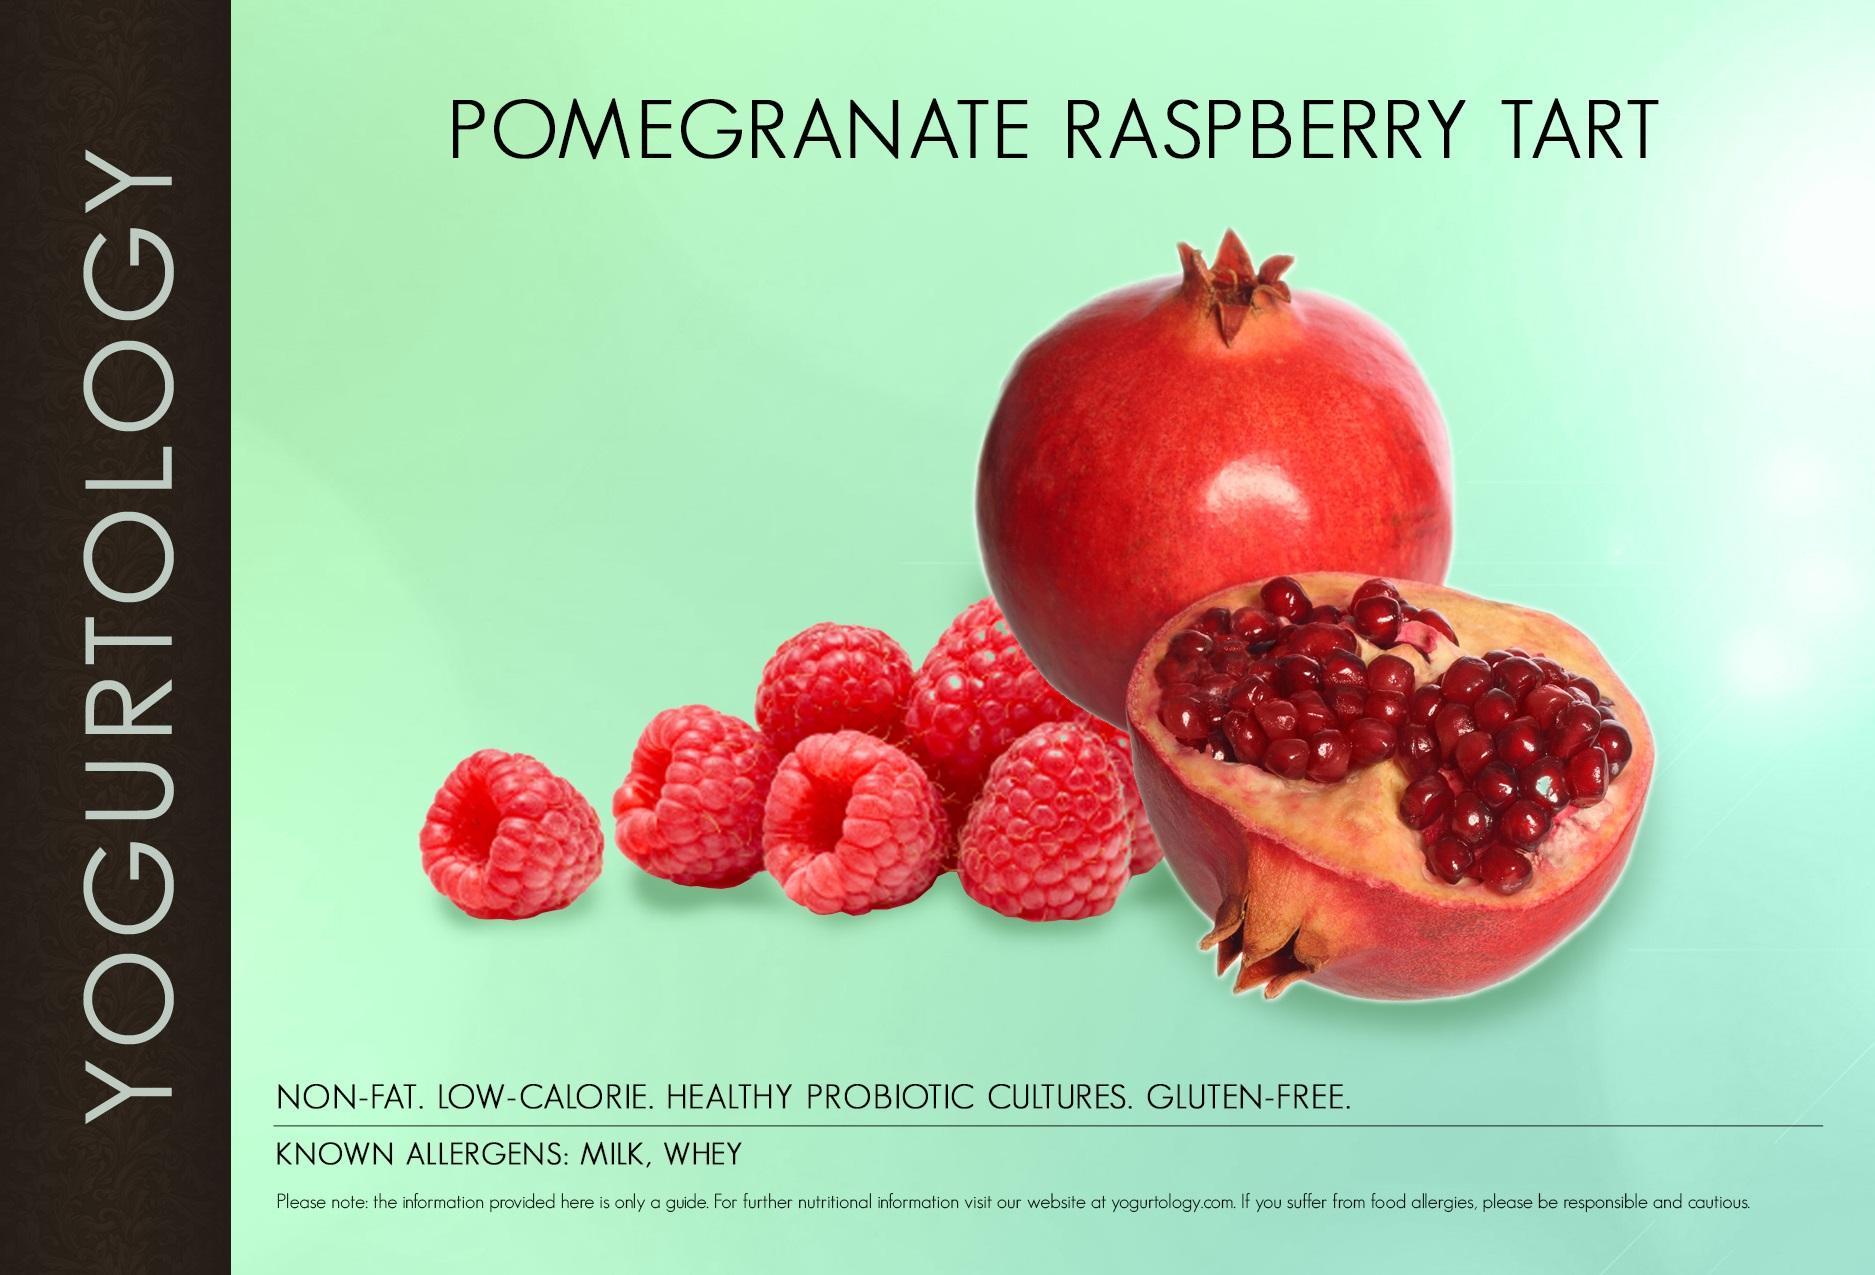 Pomegranate Raspberry Tart